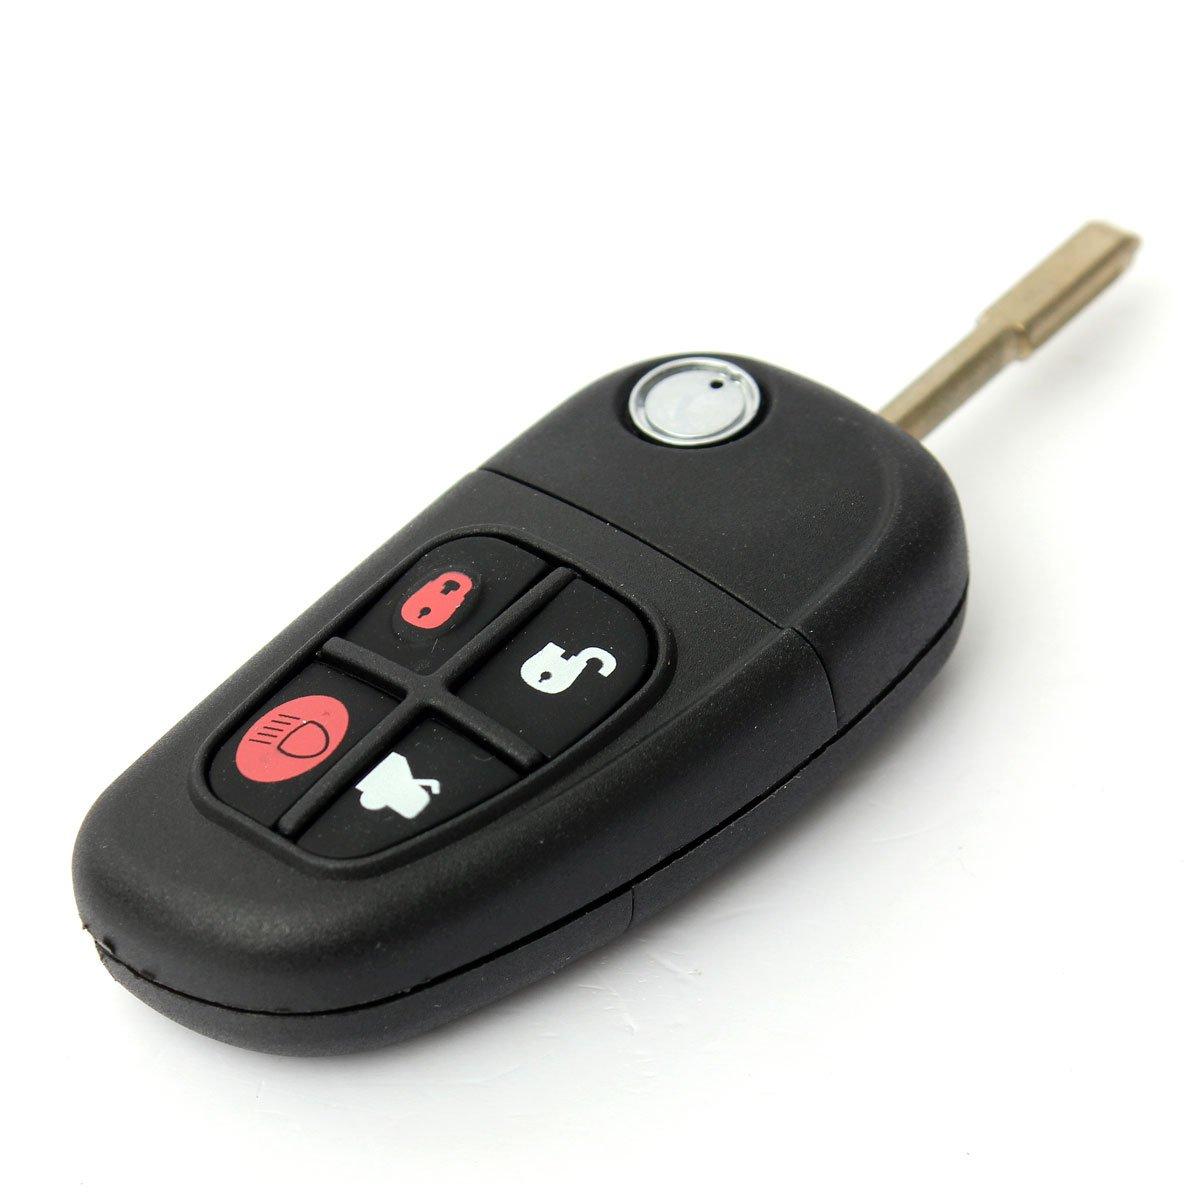 key car is cars keys what comments crap best after r whole jaguar ignition the